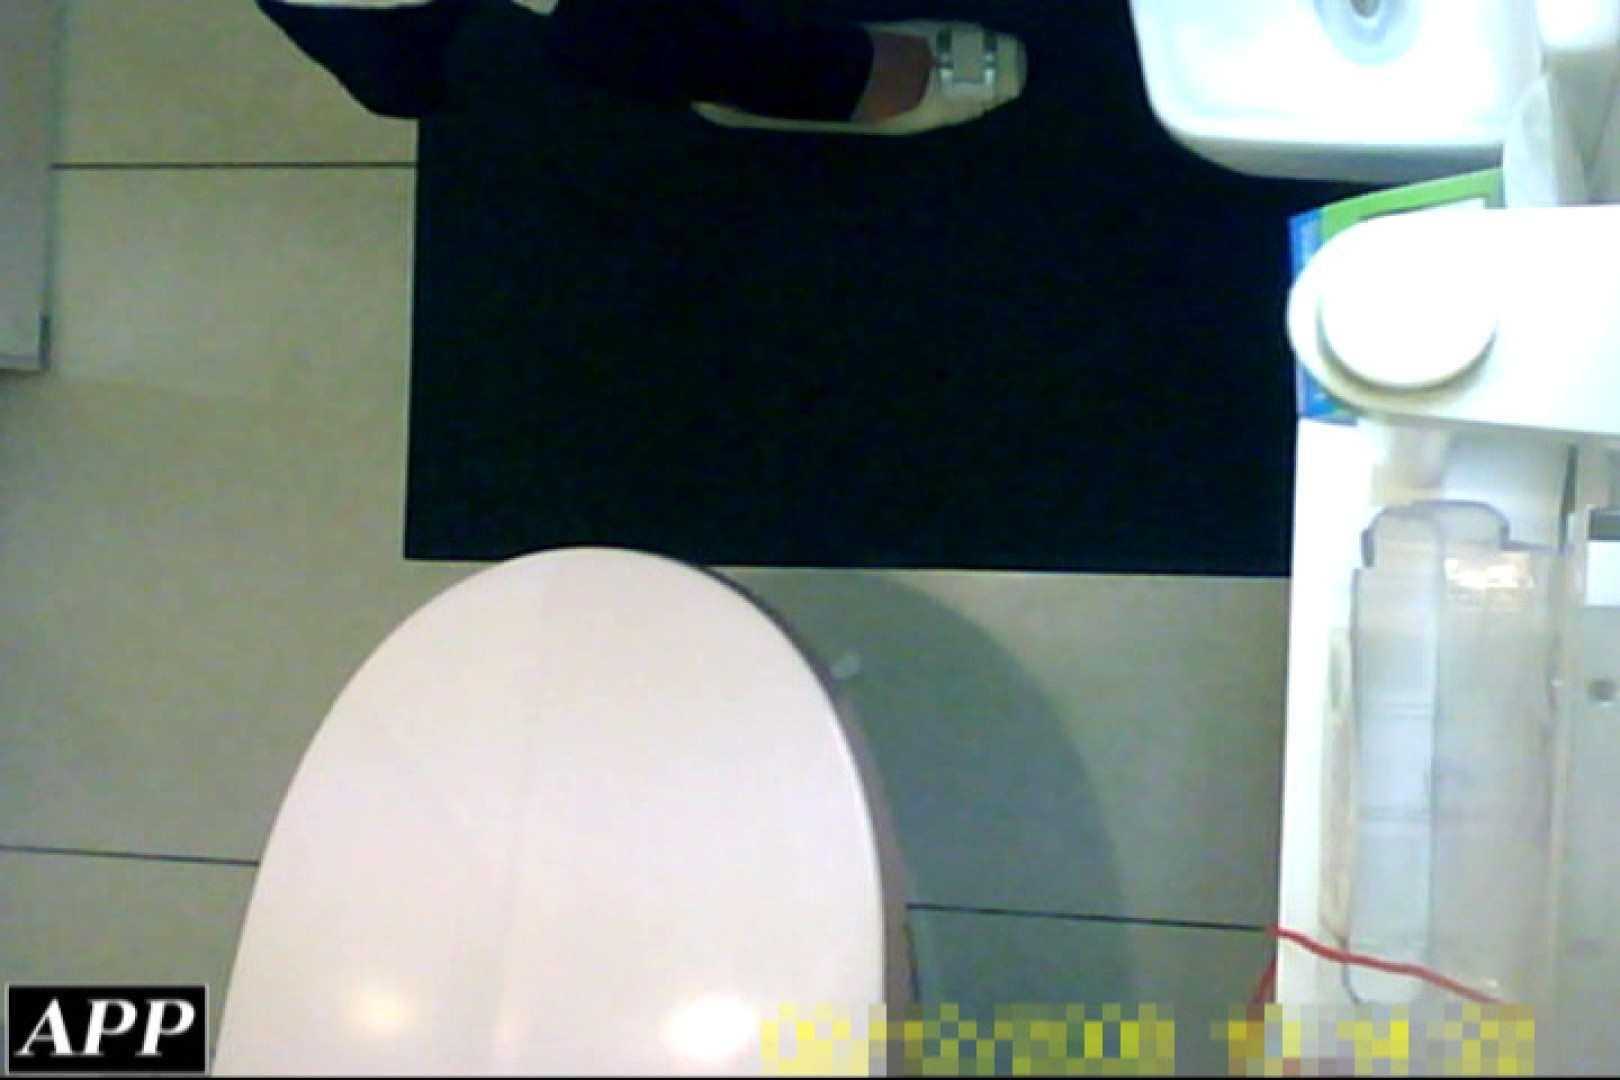 3視点洗面所 vol.118 洗面所 | OLセックス  88画像 47